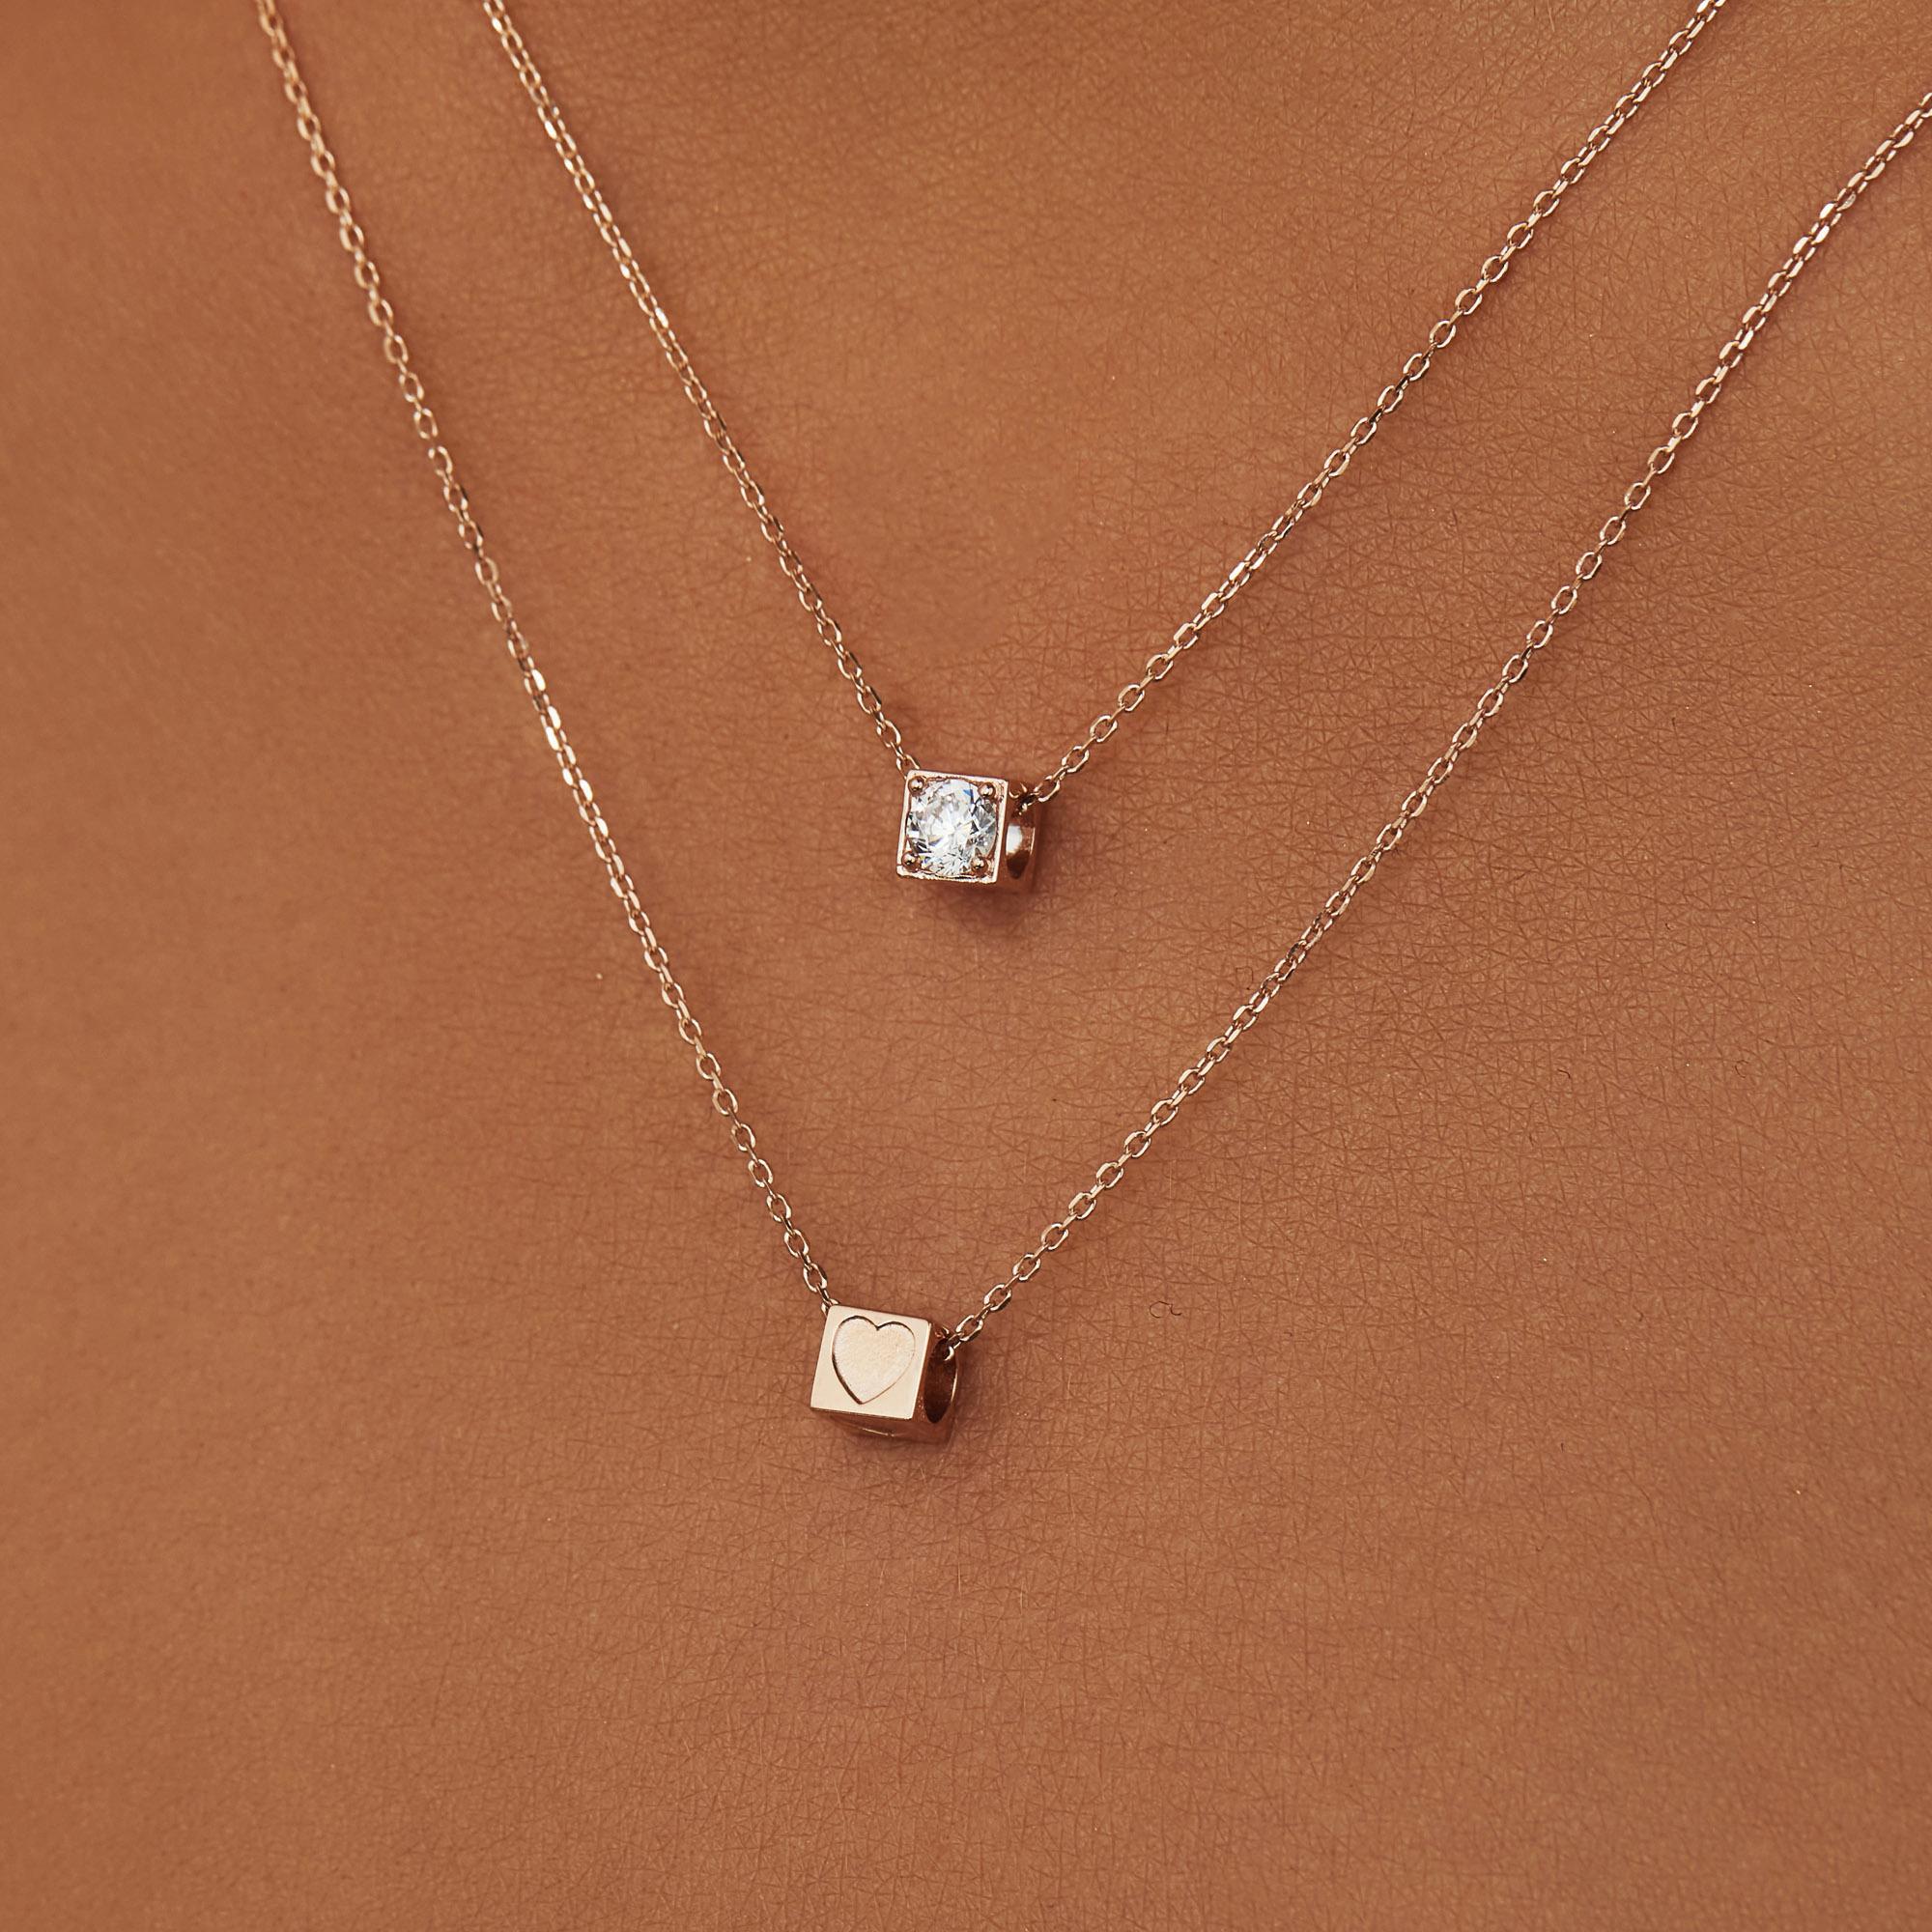 Isabel Bernard La Concorde Felie 14 karat rose gold cube charm with zirconia